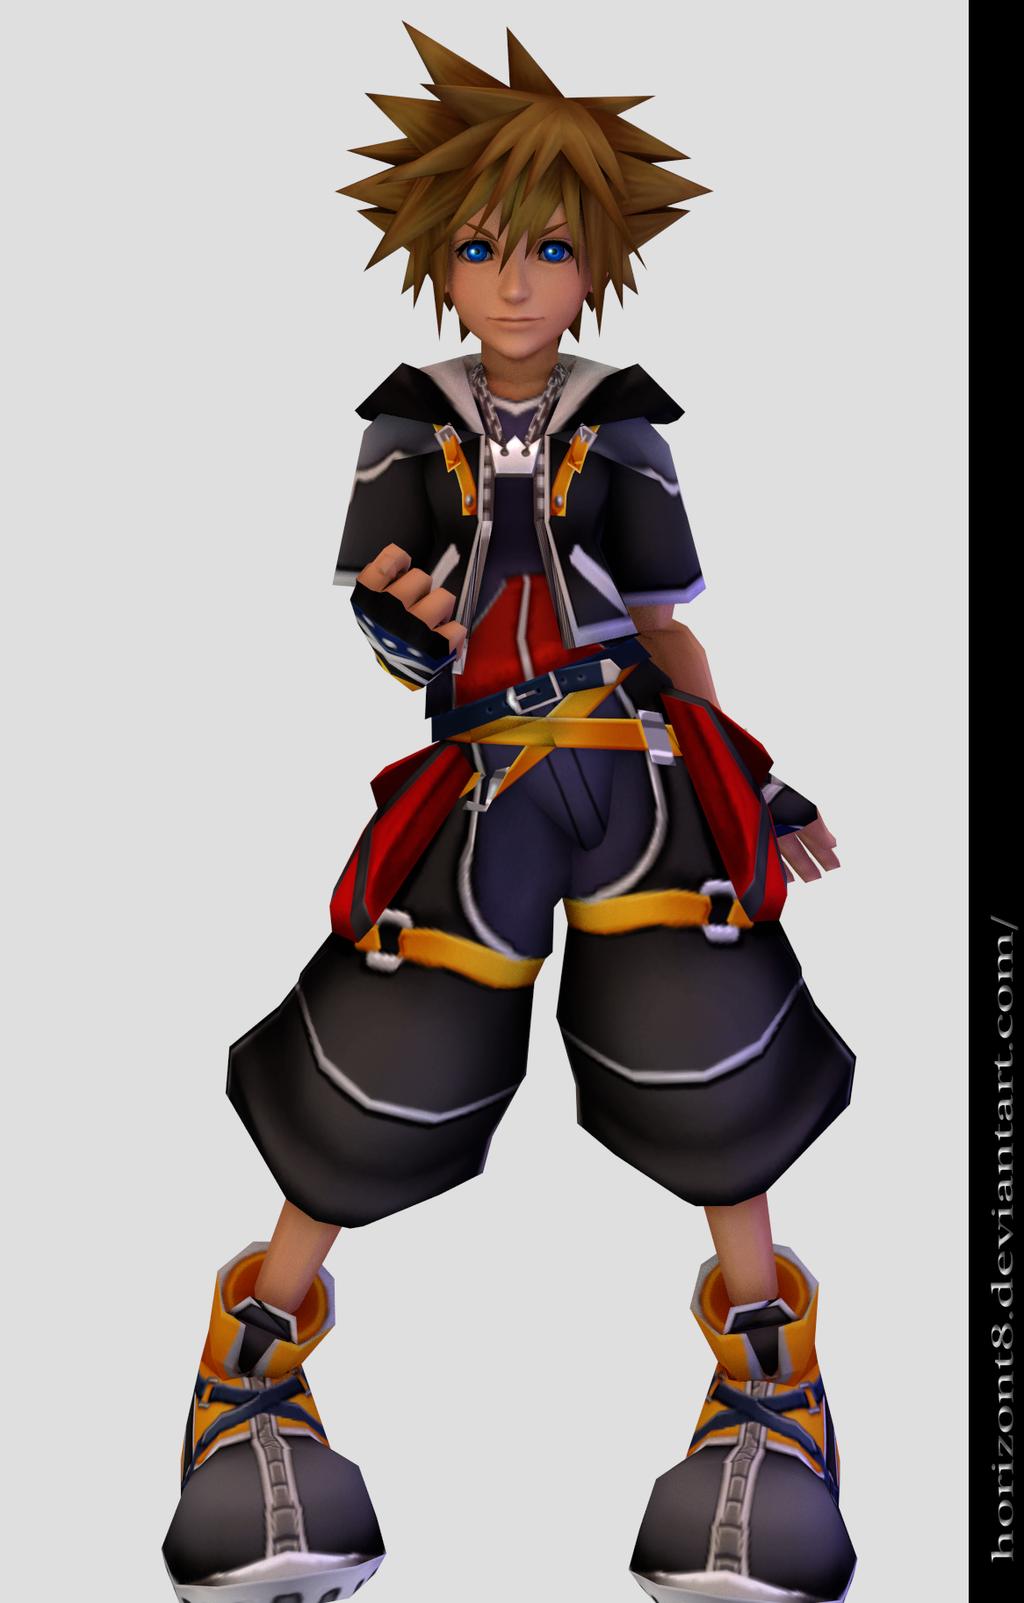 Sora Kingdom Hearts By Horizont8 D5x34bw Png 1024 1603